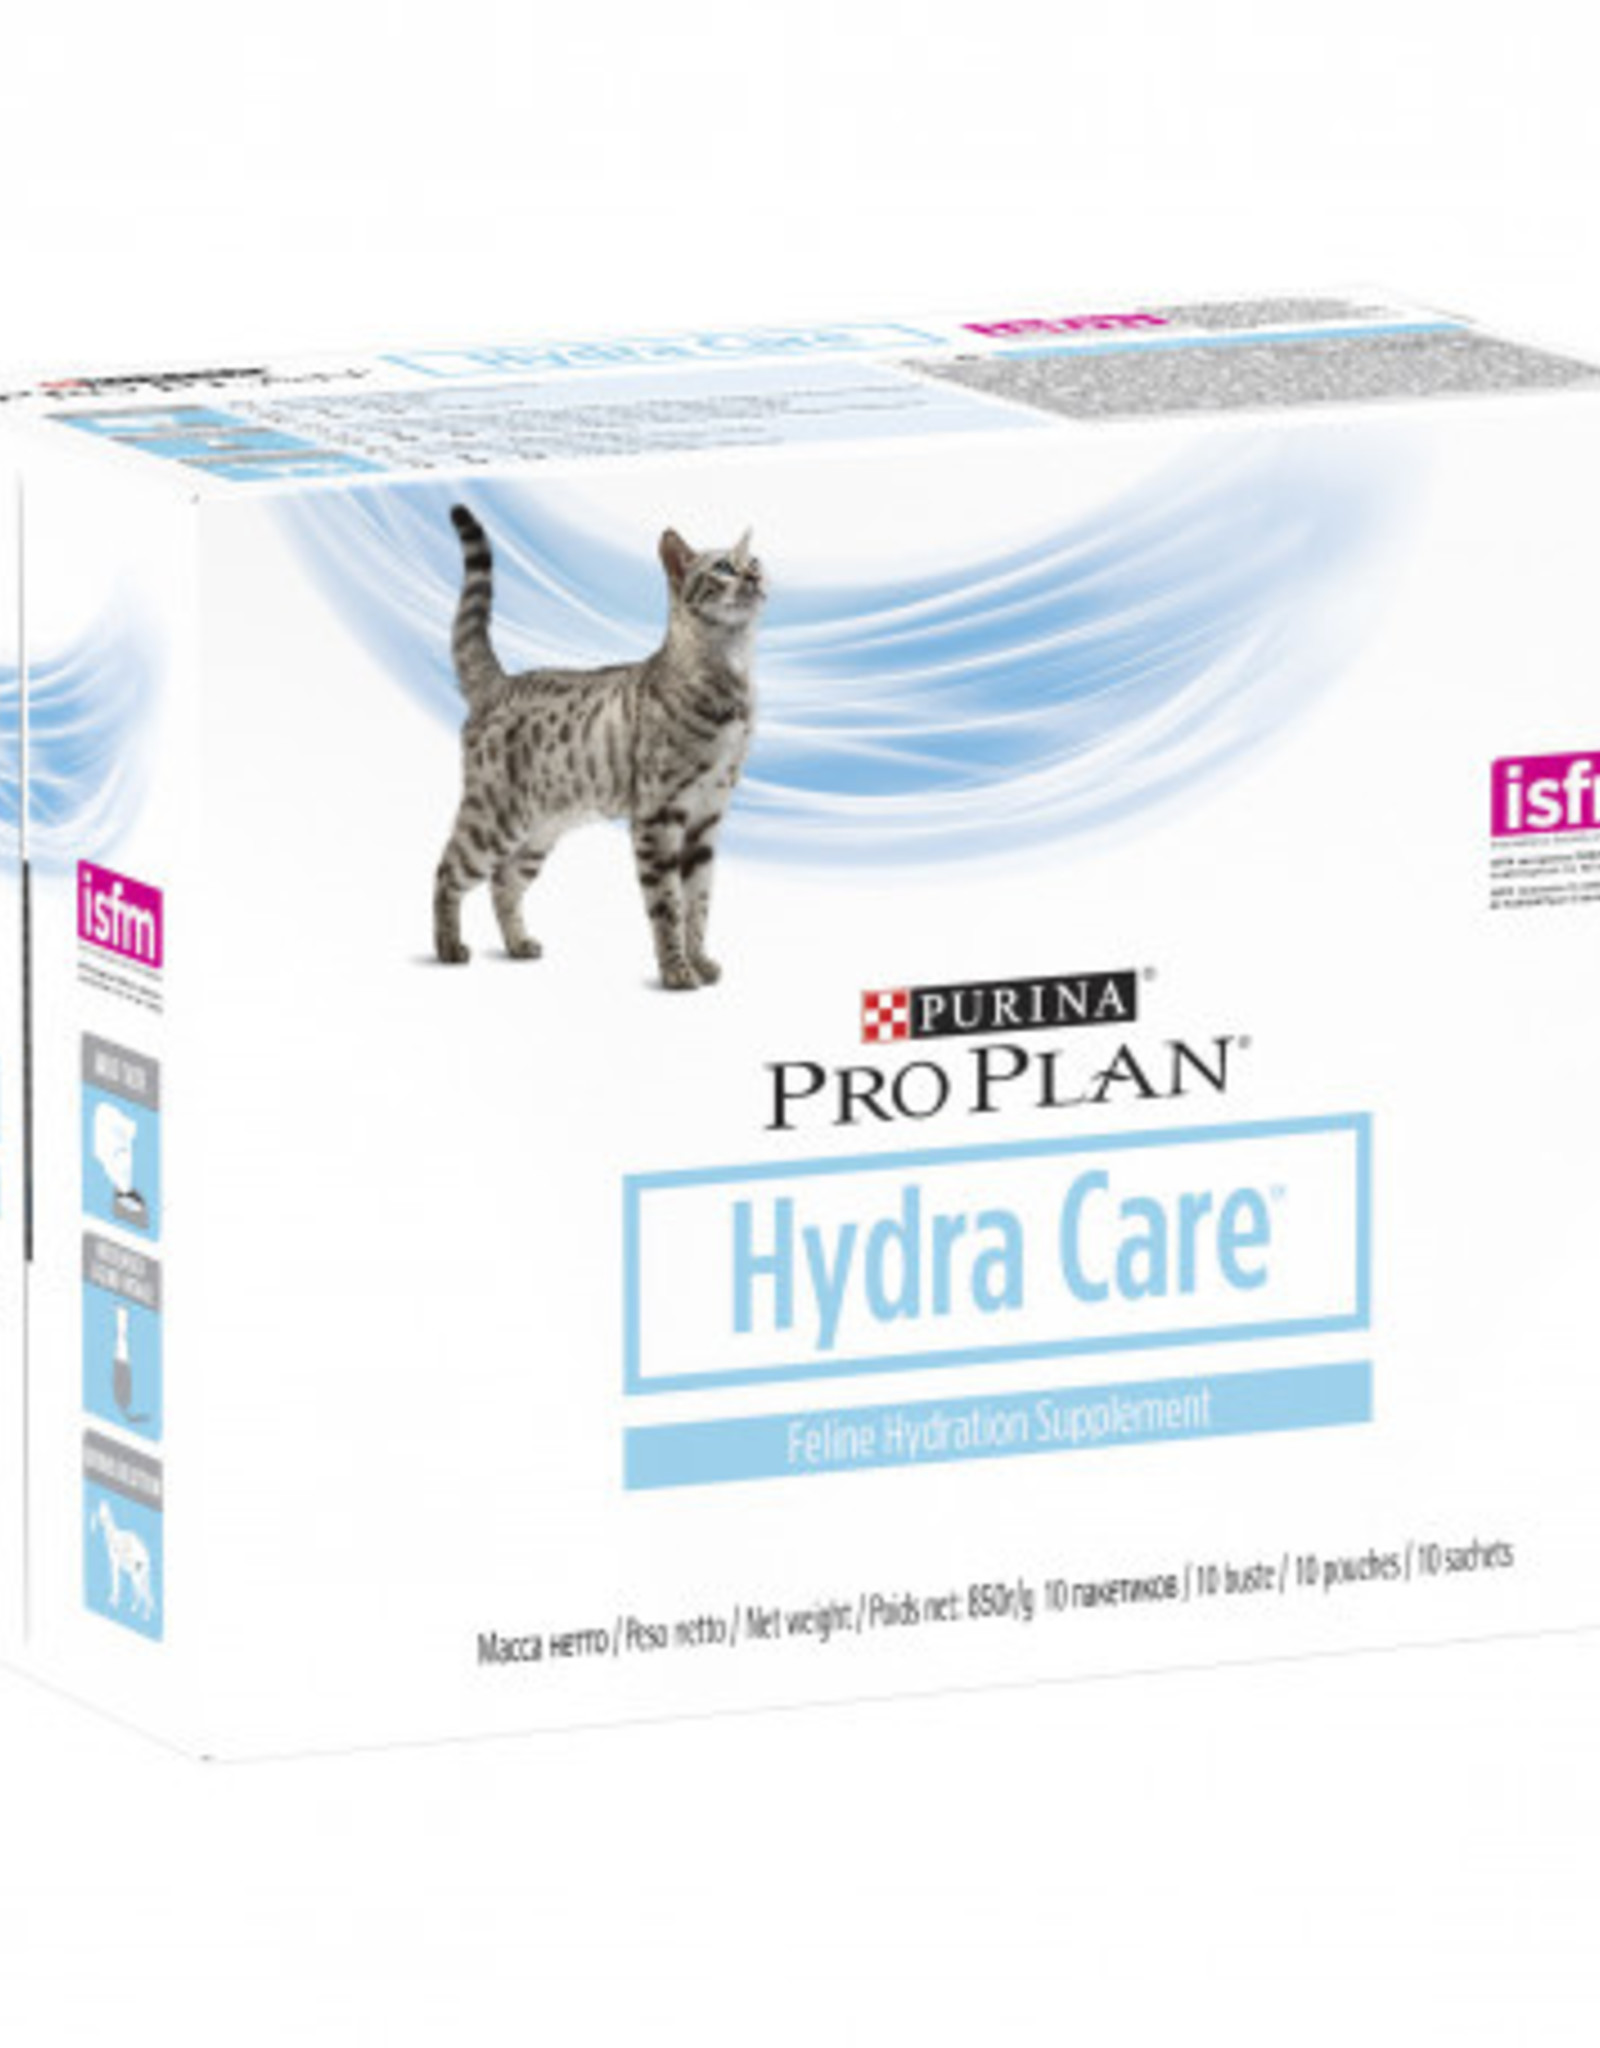 Purina Proplan Veterinary Diets Feline Hydra Care - 10 x 85g